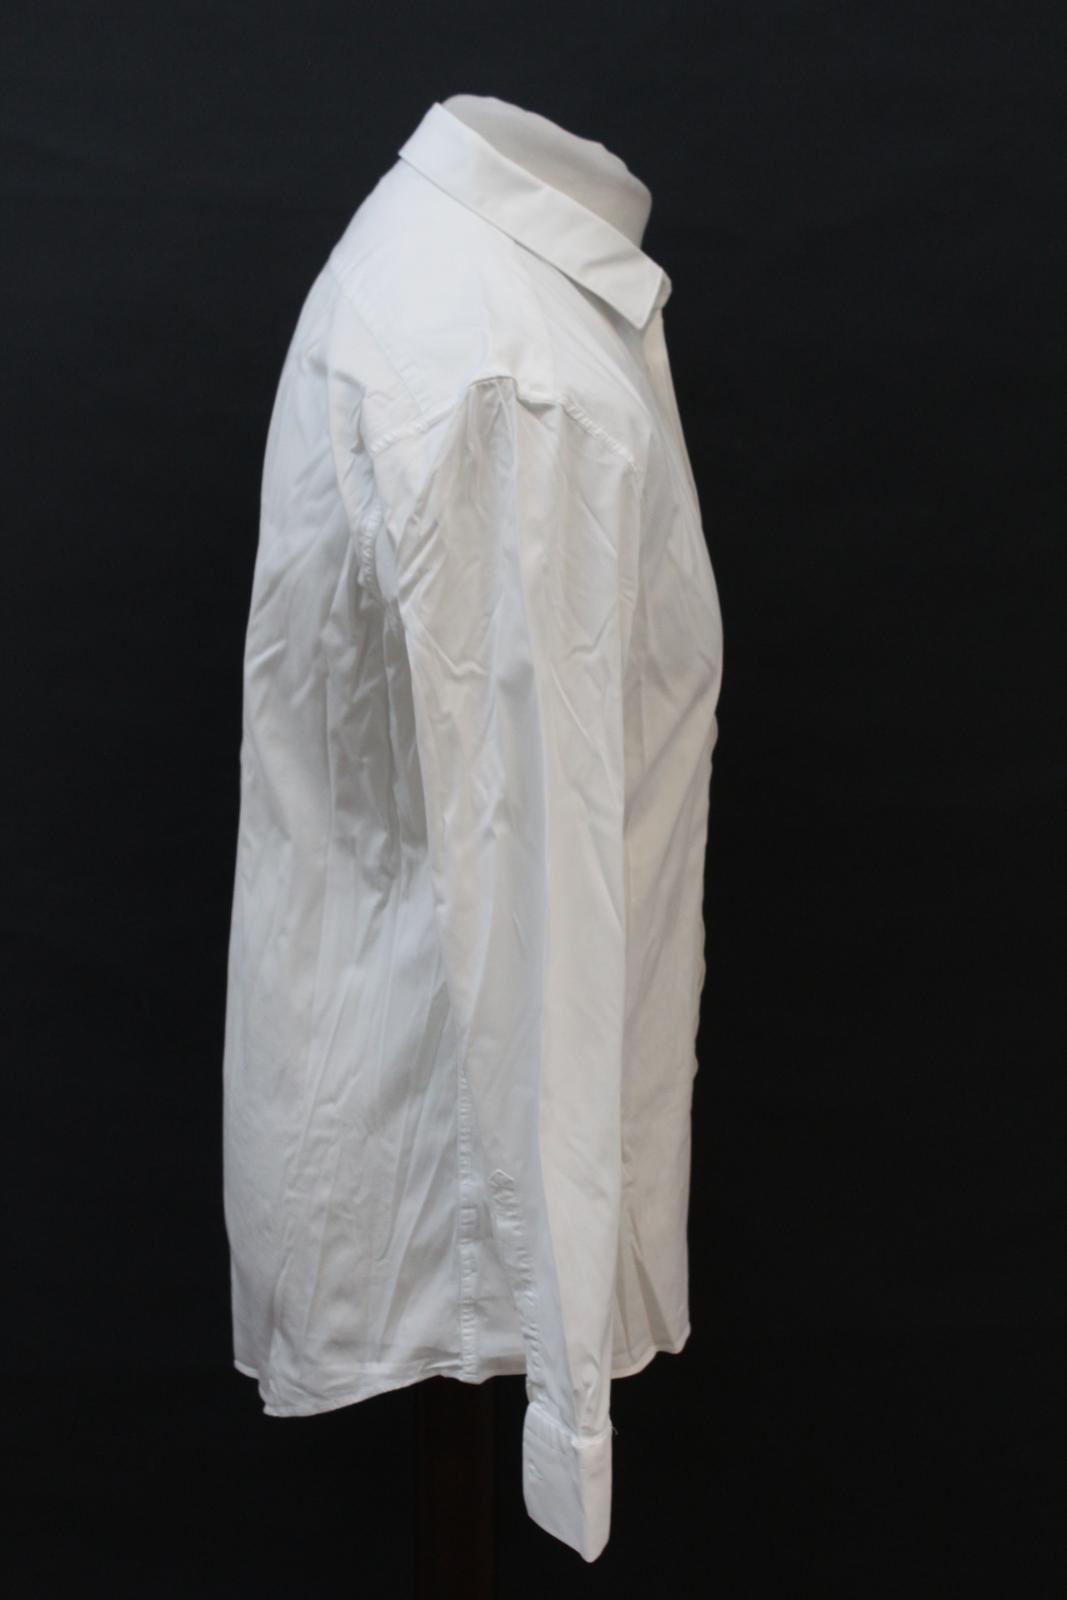 NEIL-BARRETT-Men-039-s-White-Cotton-Blend-Slim-Fit-Formal-Shirt-Collar-16-5-034-42cm miniatura 4